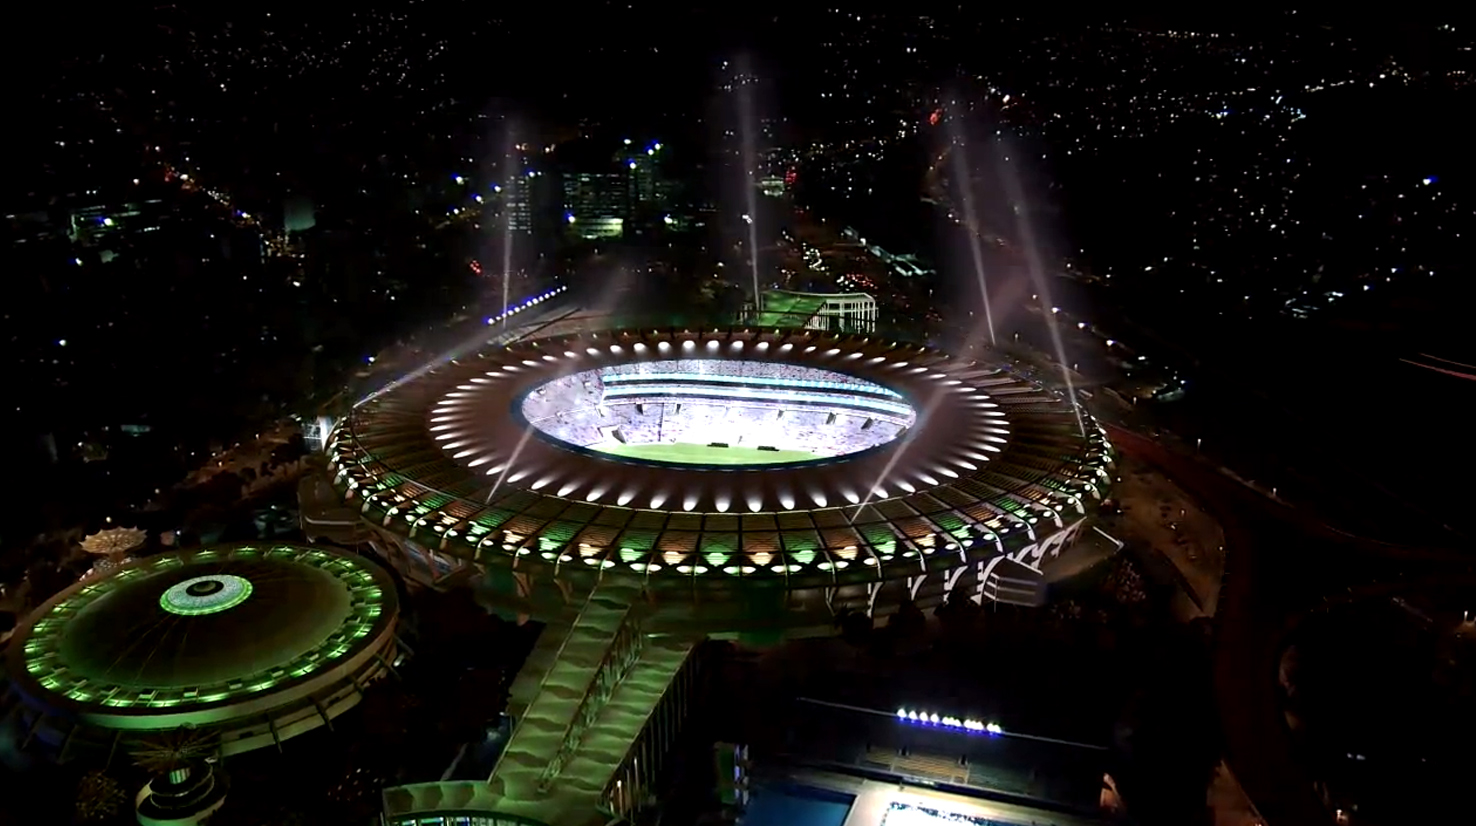 Estadio do Maracana - Estadio do Maracana